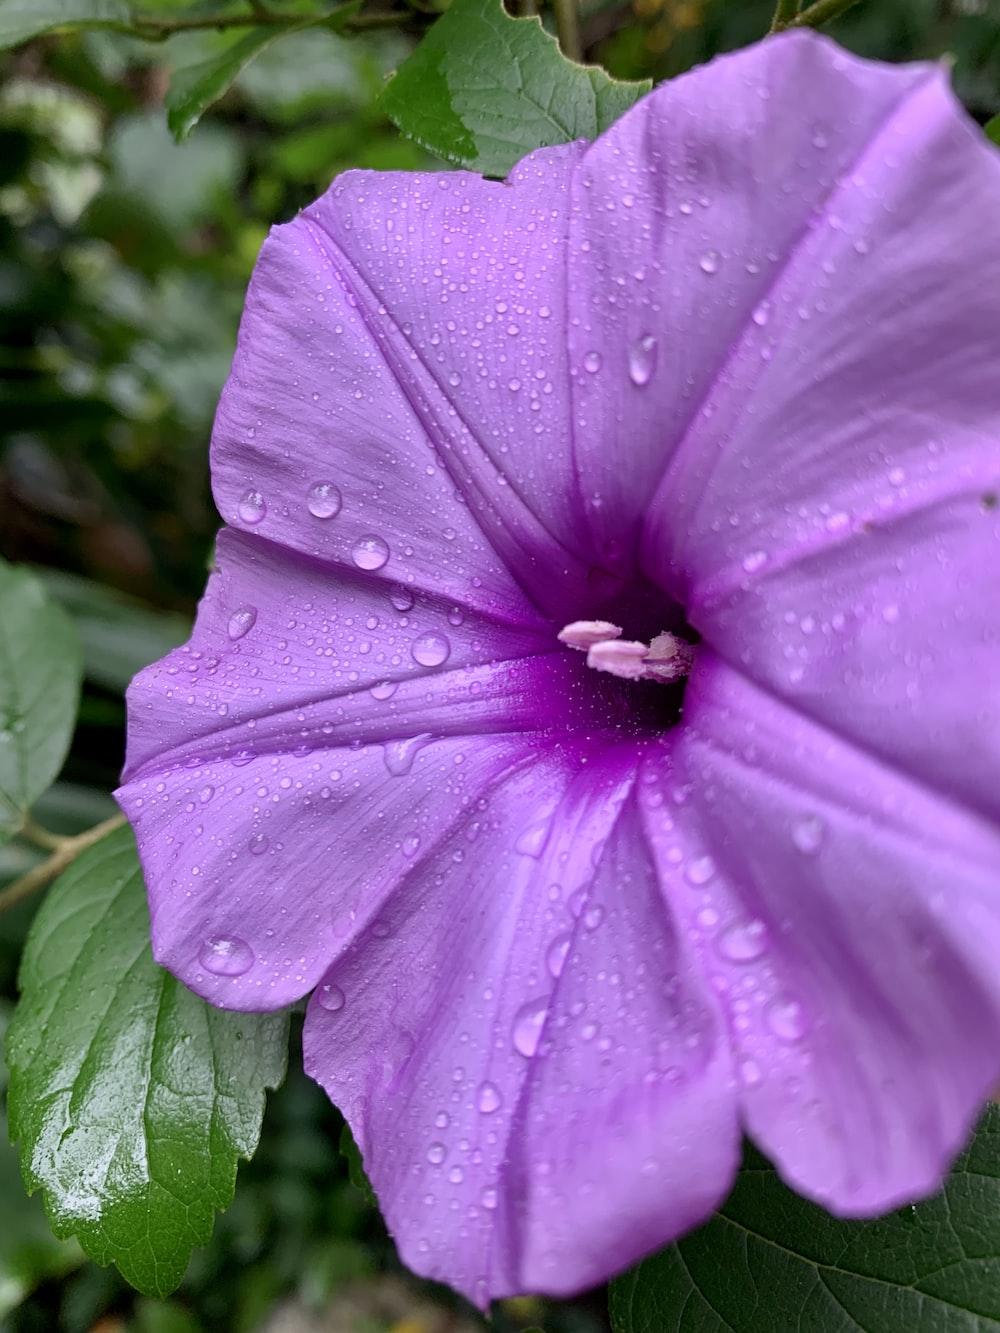 dew covered purple flower